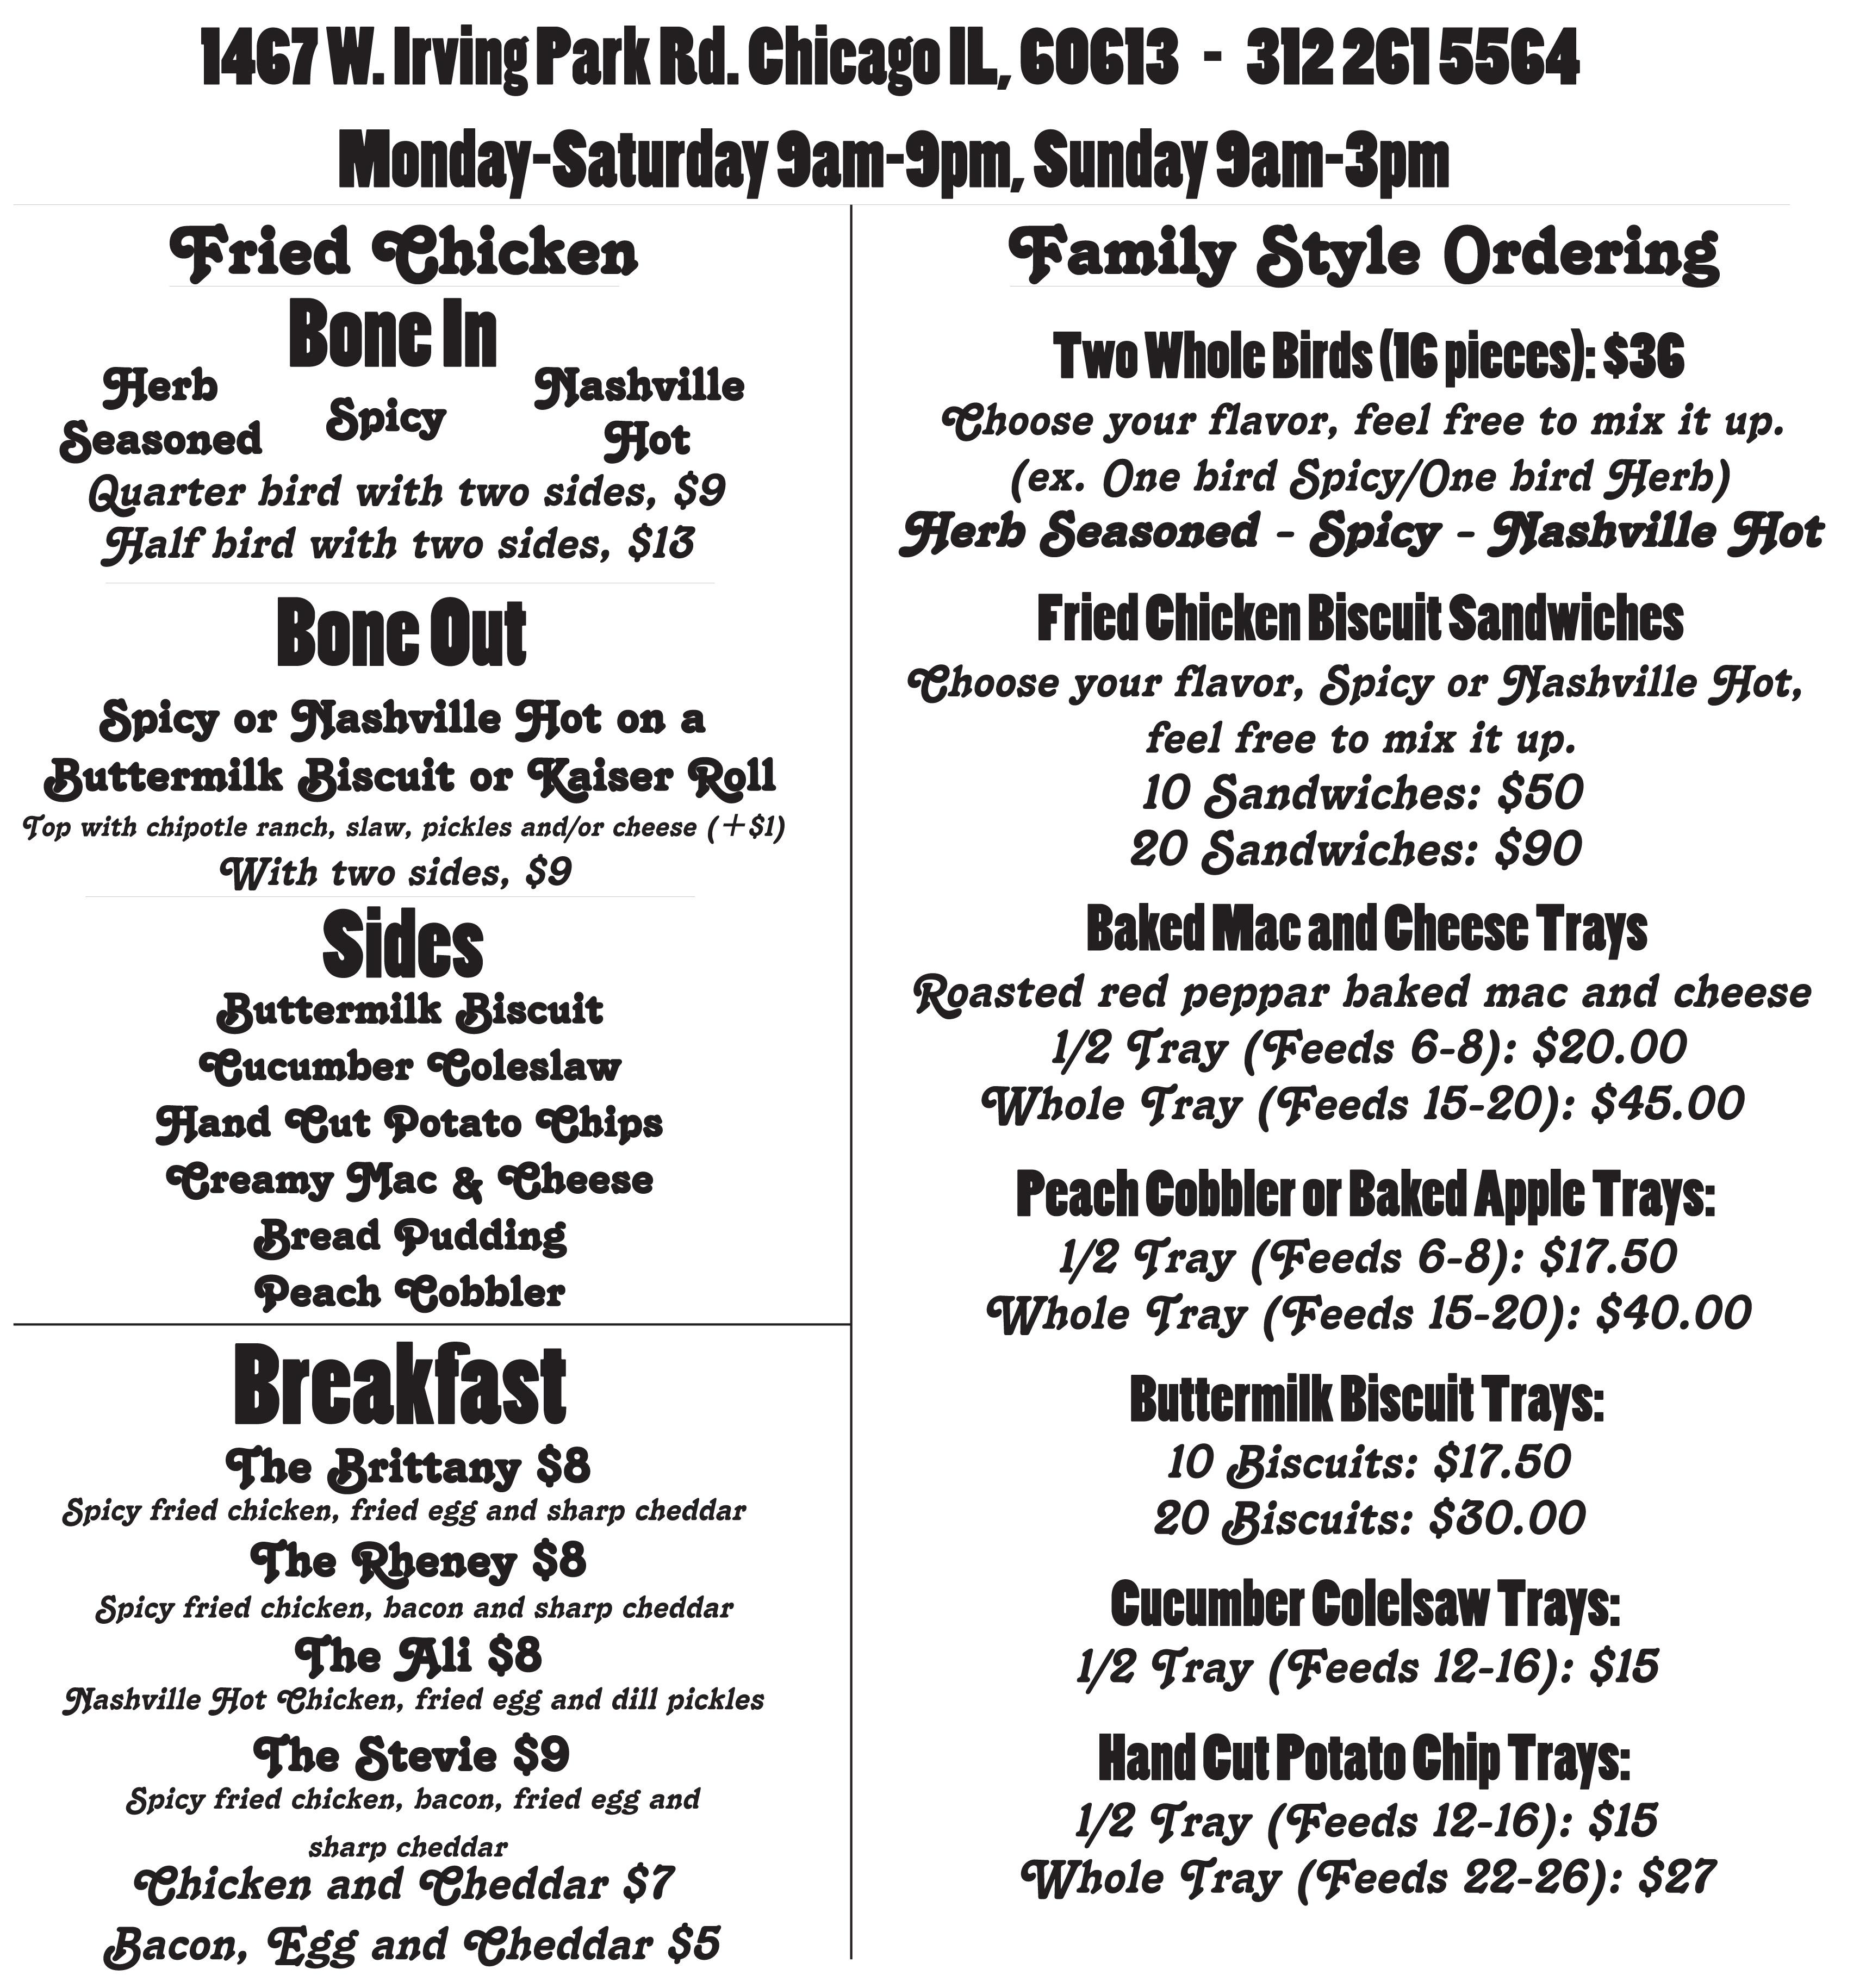 carolina kitchen menu] - 100 images - r d menu picture of r d ...